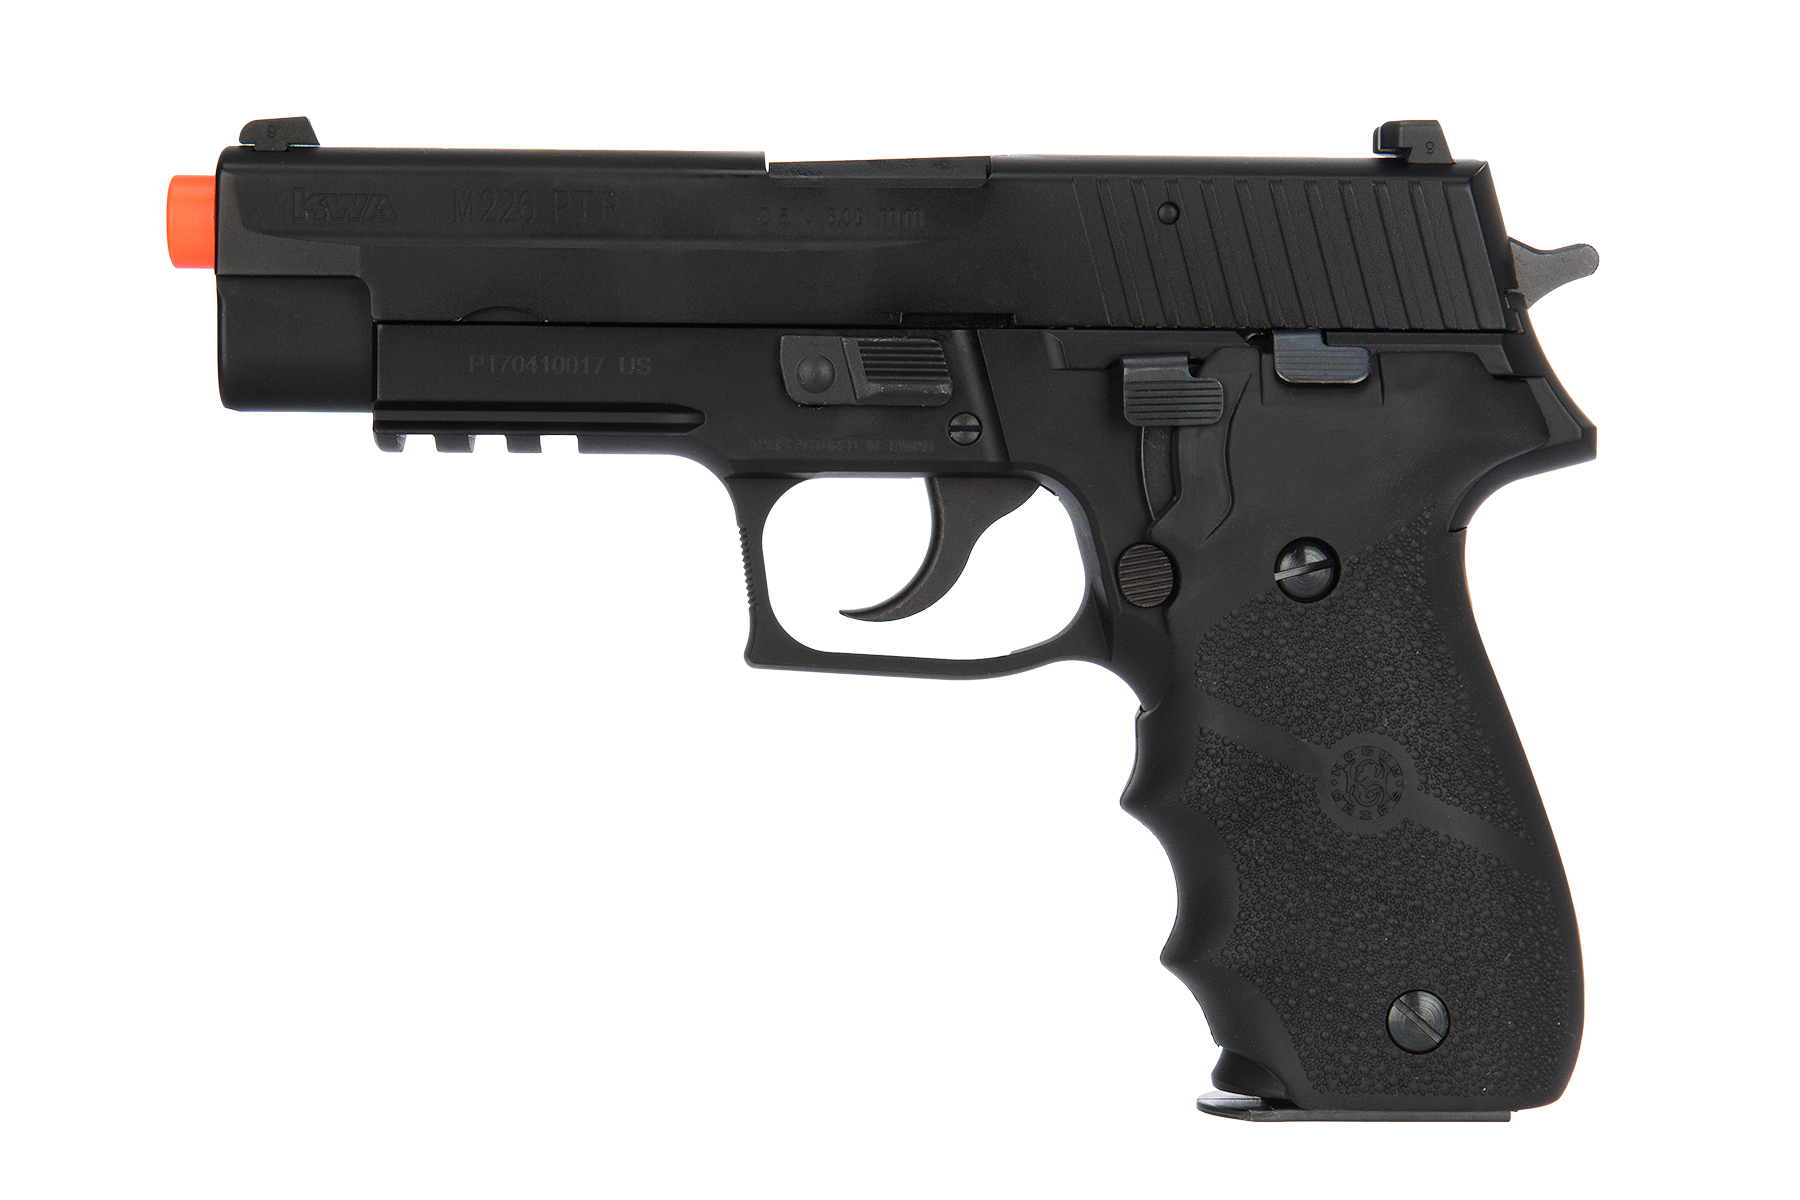 Replica Airguns Blog Airsoft Pellet Bb Gun Reviews Mosin Nagant Schematic Products18082 1800x1200 1543534313